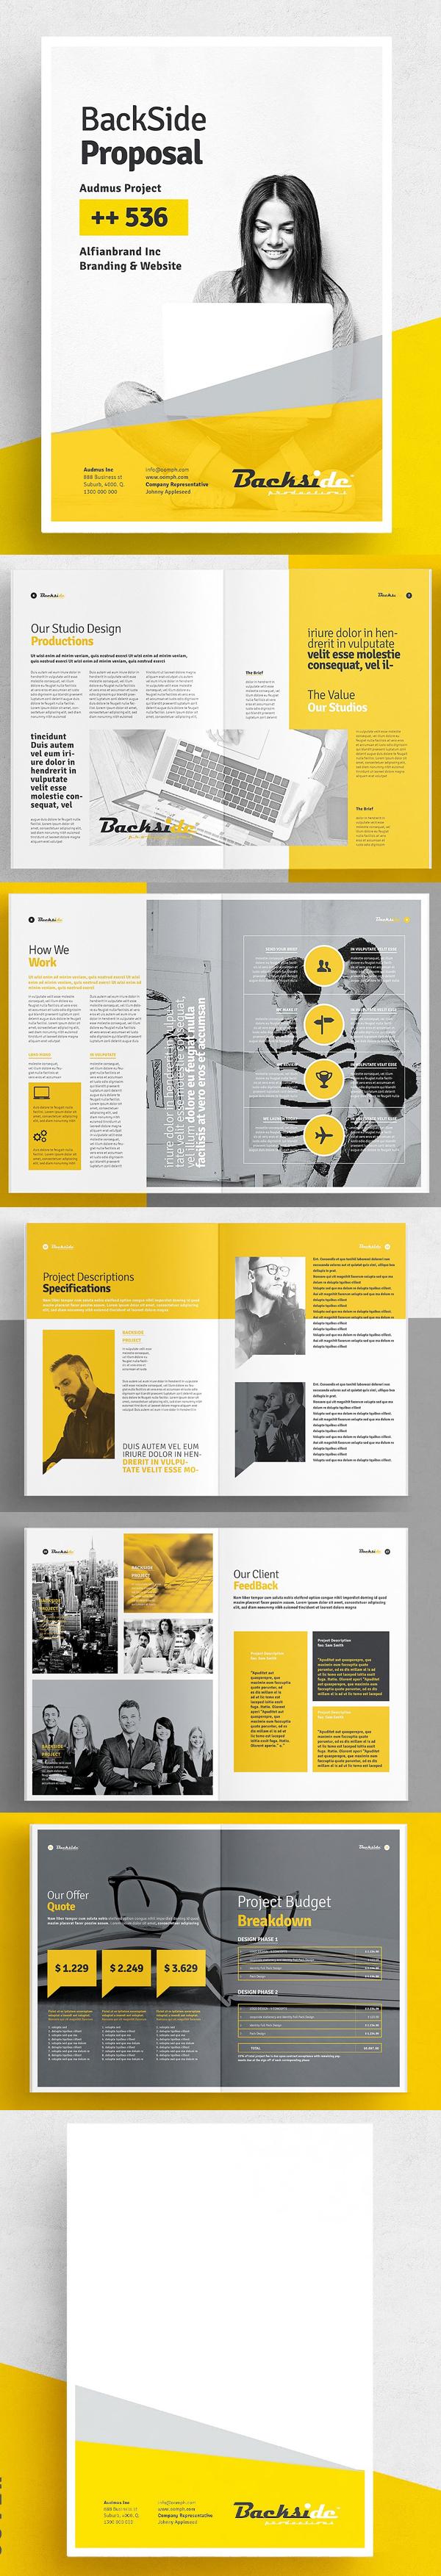 100 Professional Corporate Brochure Templates - 26